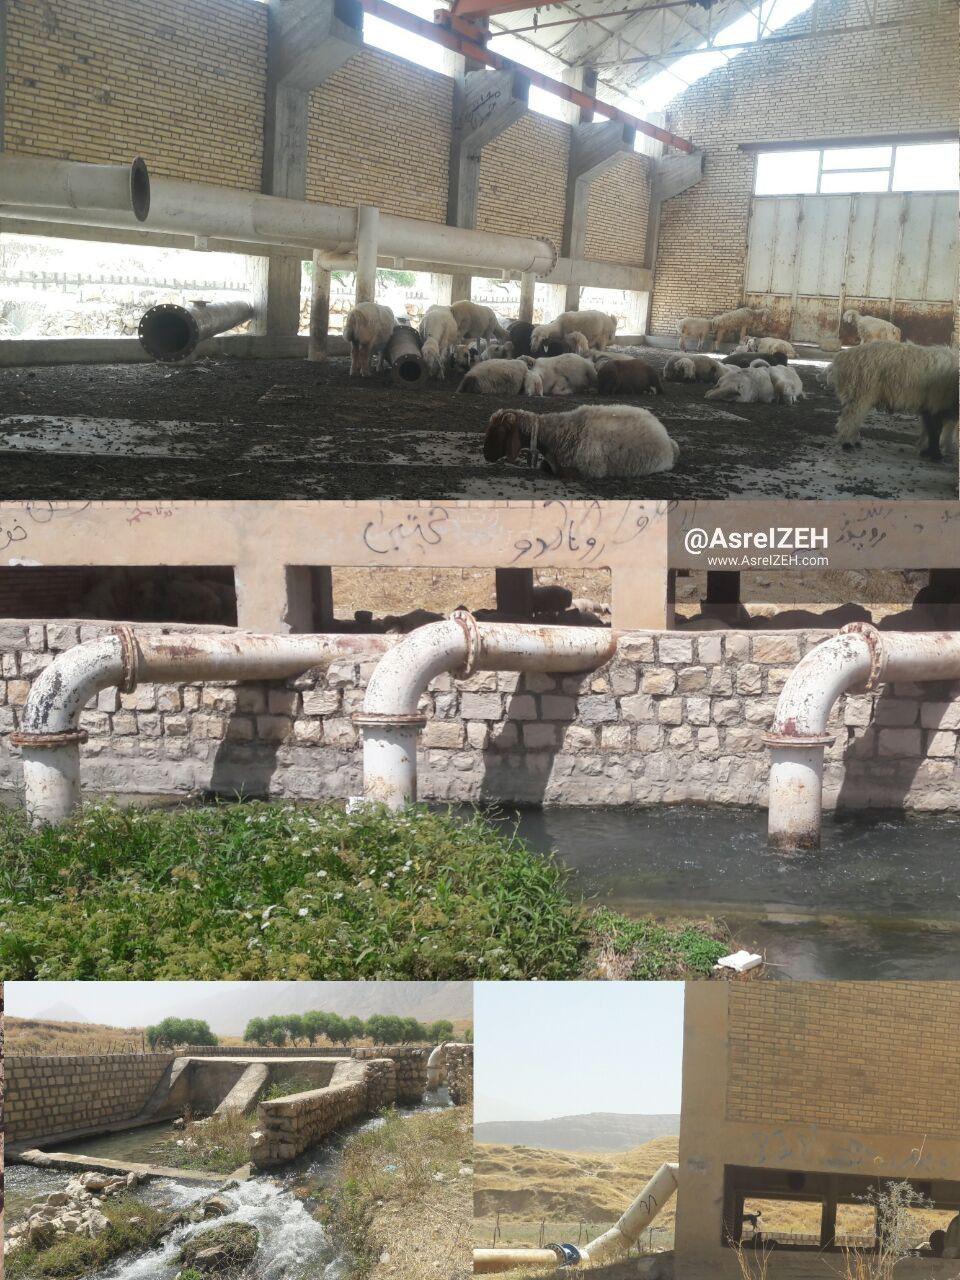 عکس/ تبدیل شدن پروژه انتقال آب چشمه سیاهچال سوسن به اسطبل گوسفندان